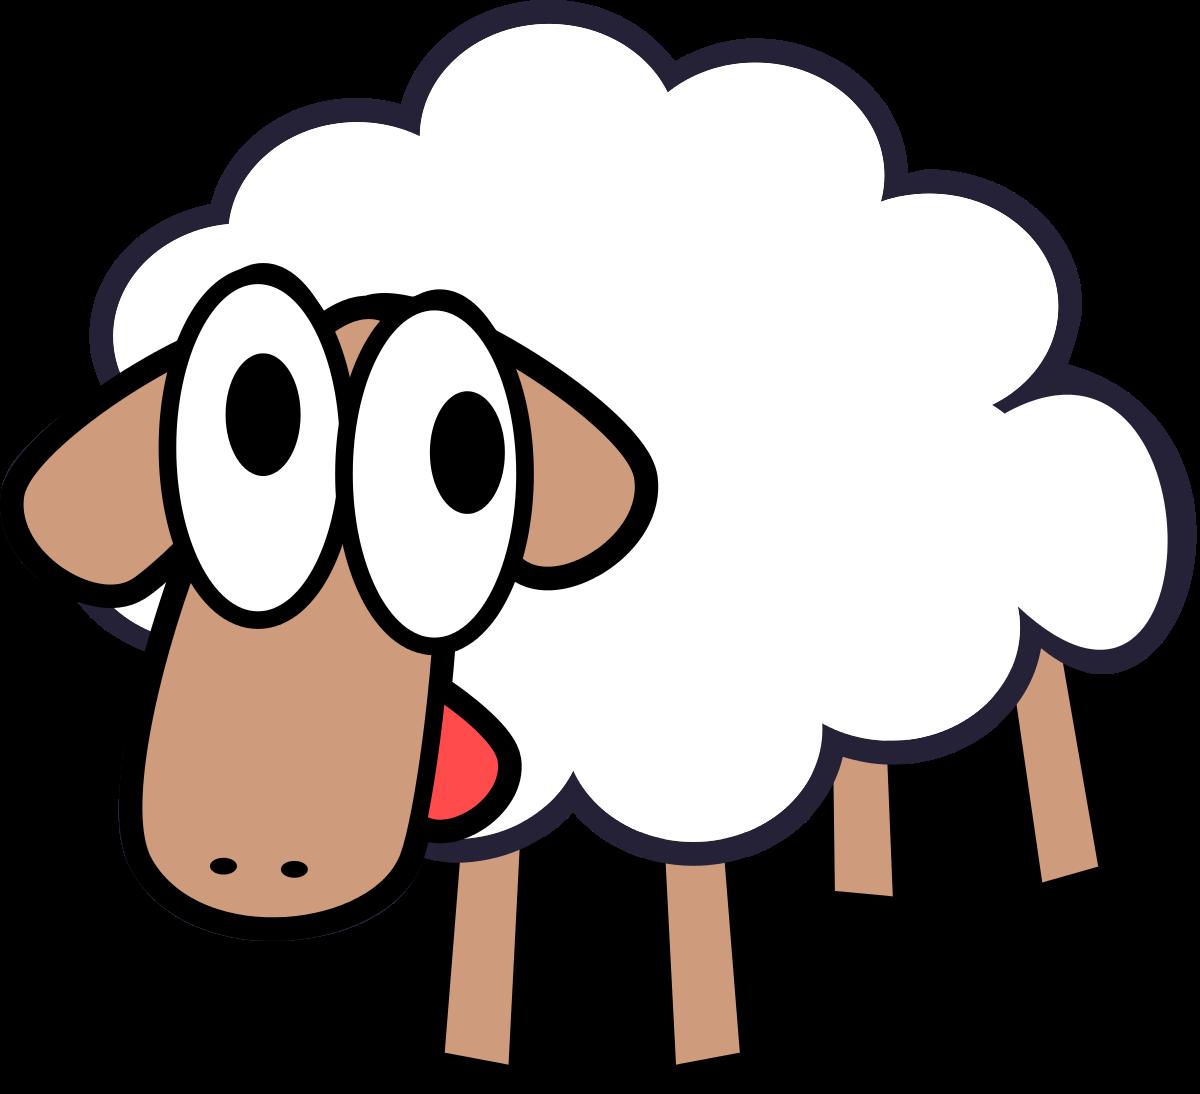 Sheep Clipart u0026amp; Sheep Clip Art Images - ClipartALL clipartall.com